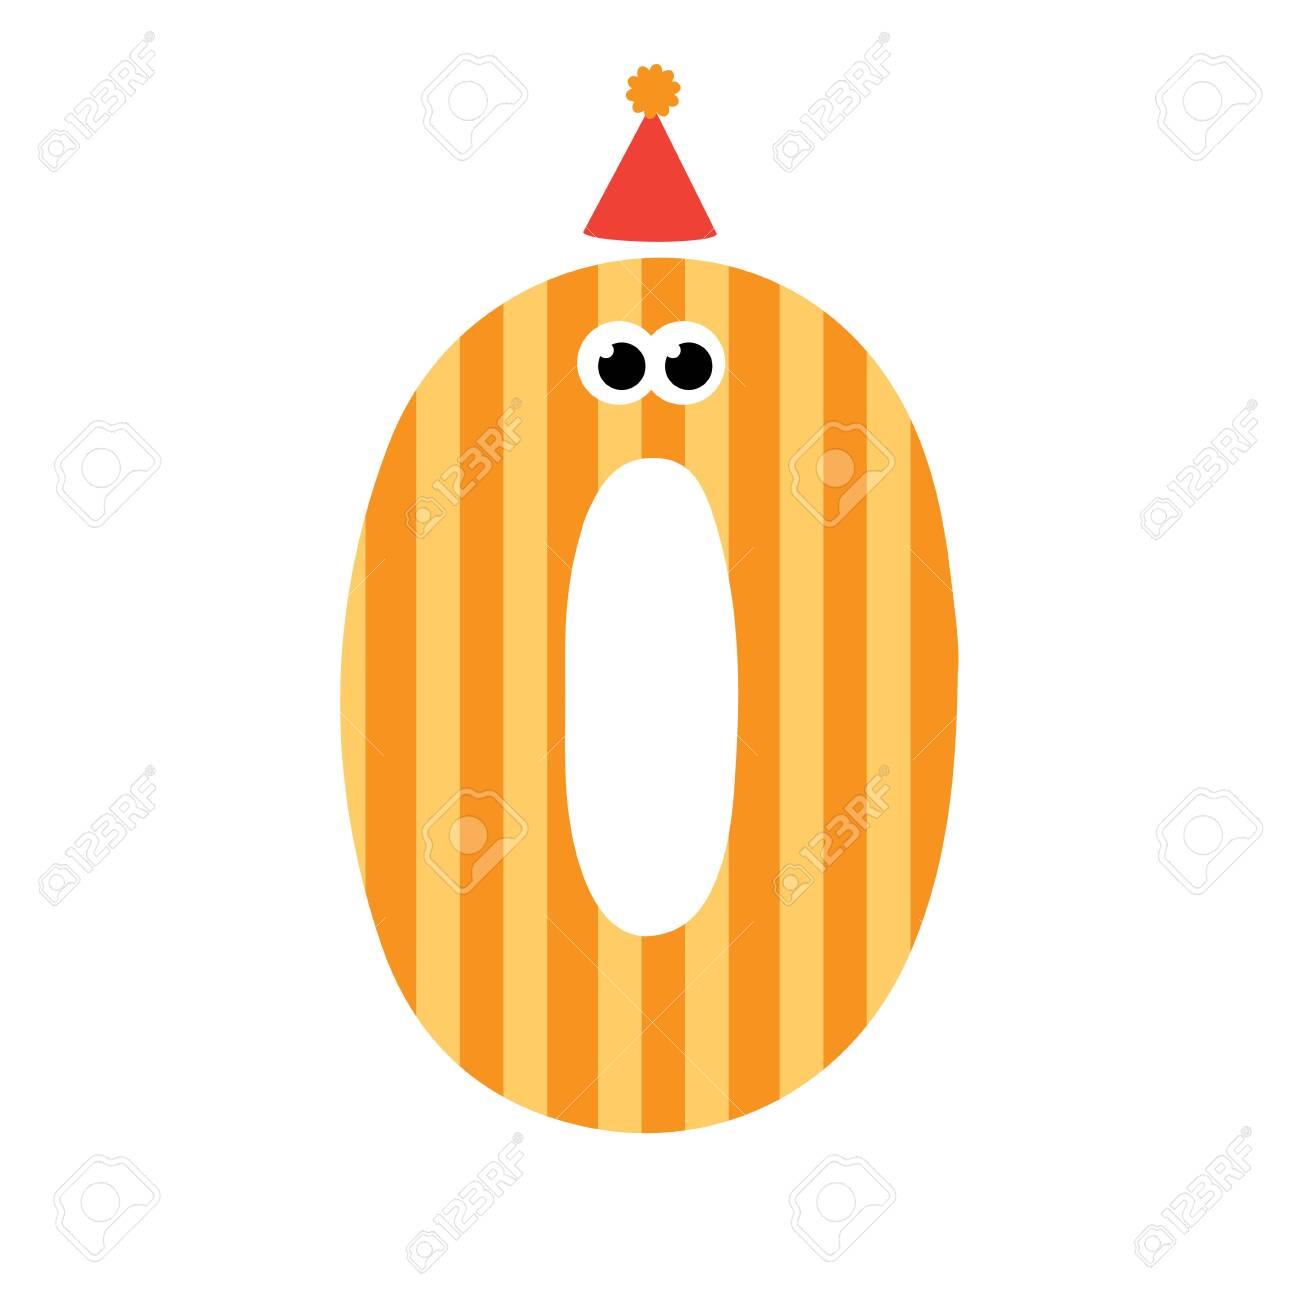 Cute happy birthday number zero. Vector illustration - 140223117